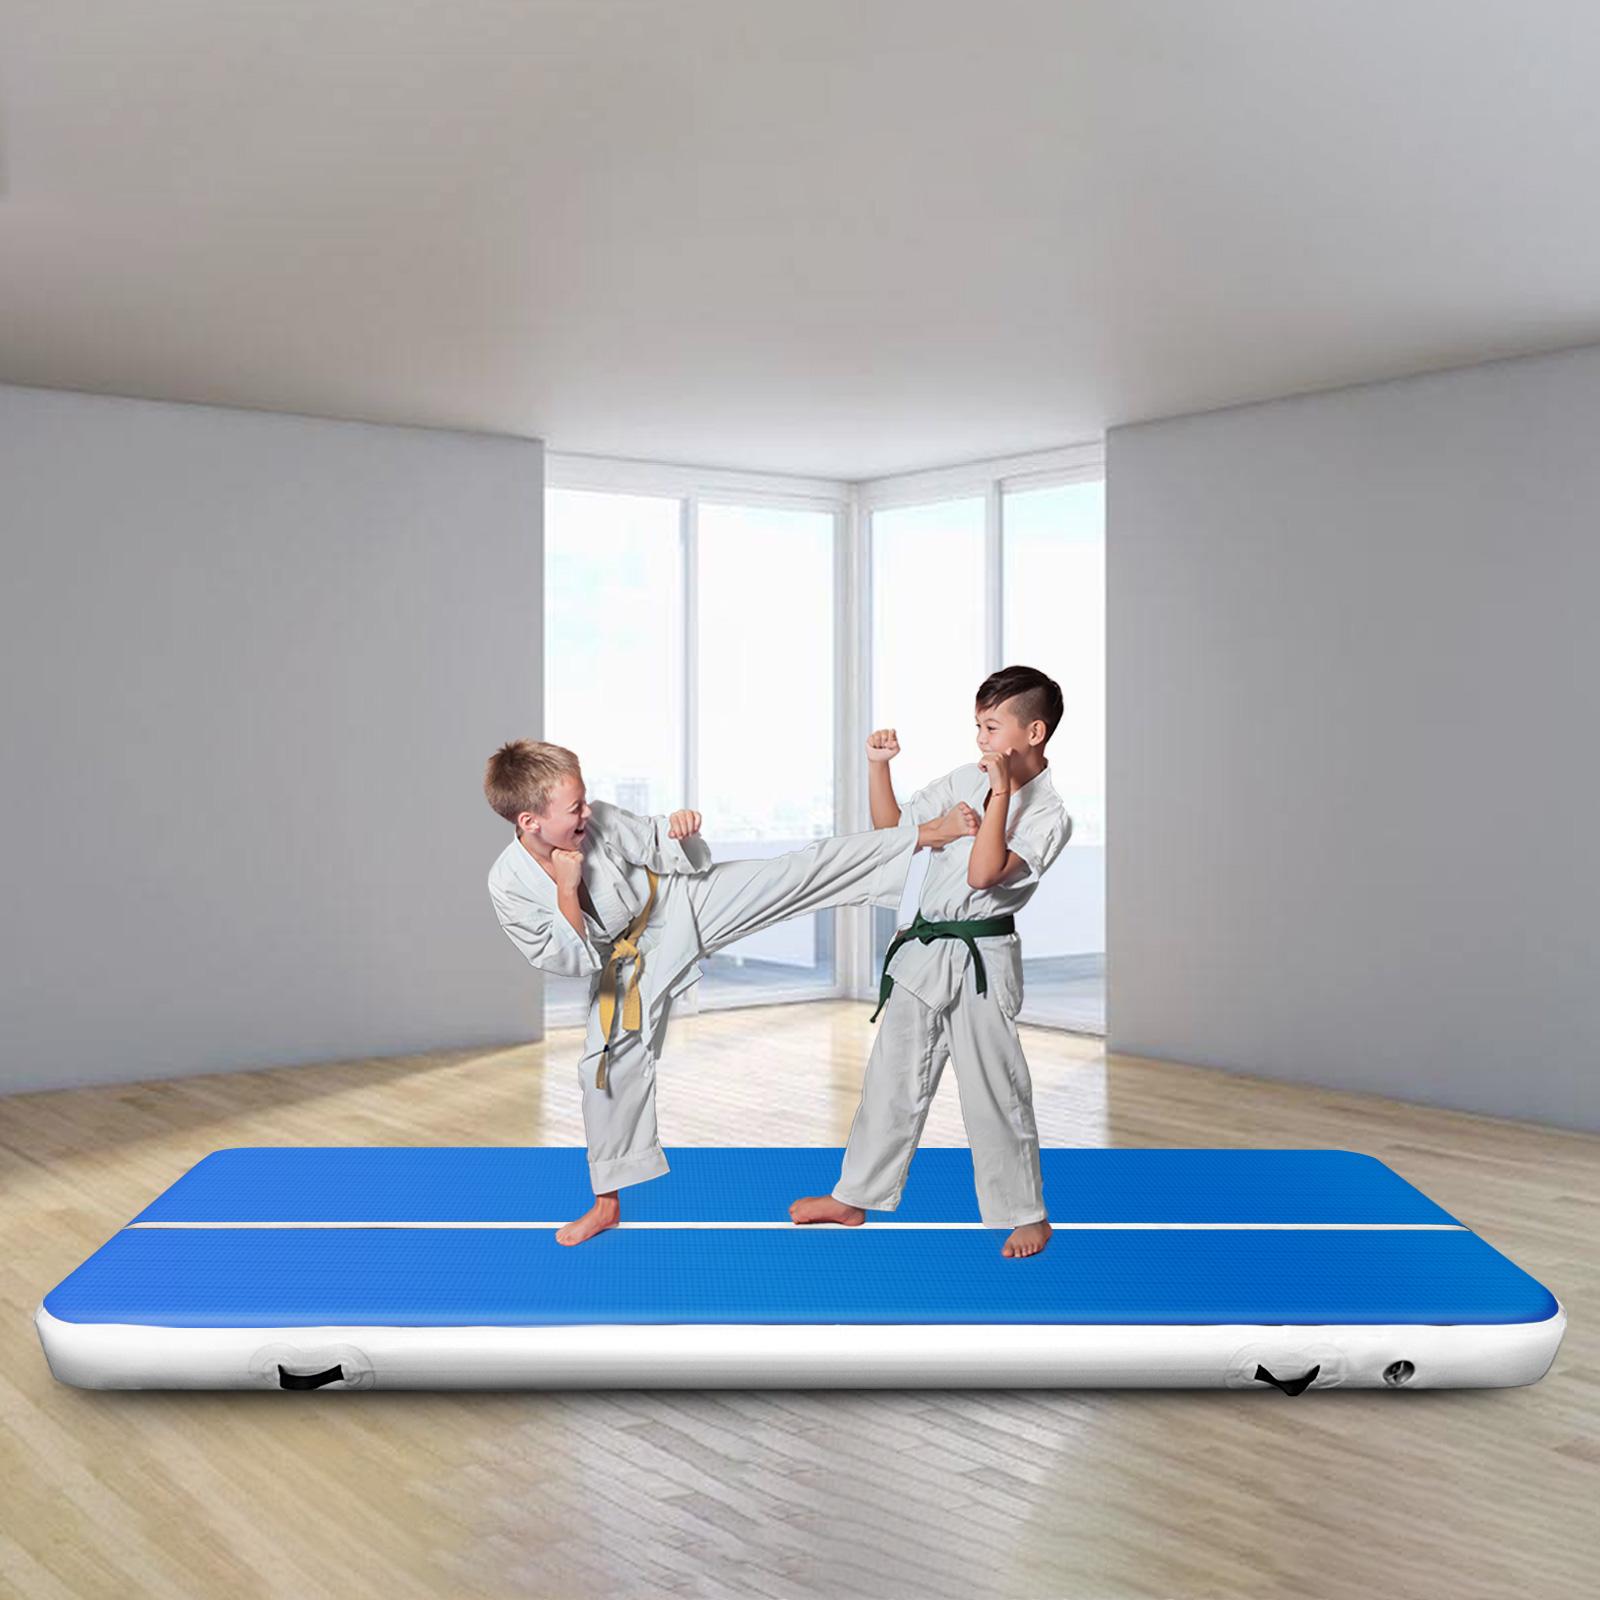 Air Track Floor Tumbling Pad Inflatable Gym Mat Gymnastic